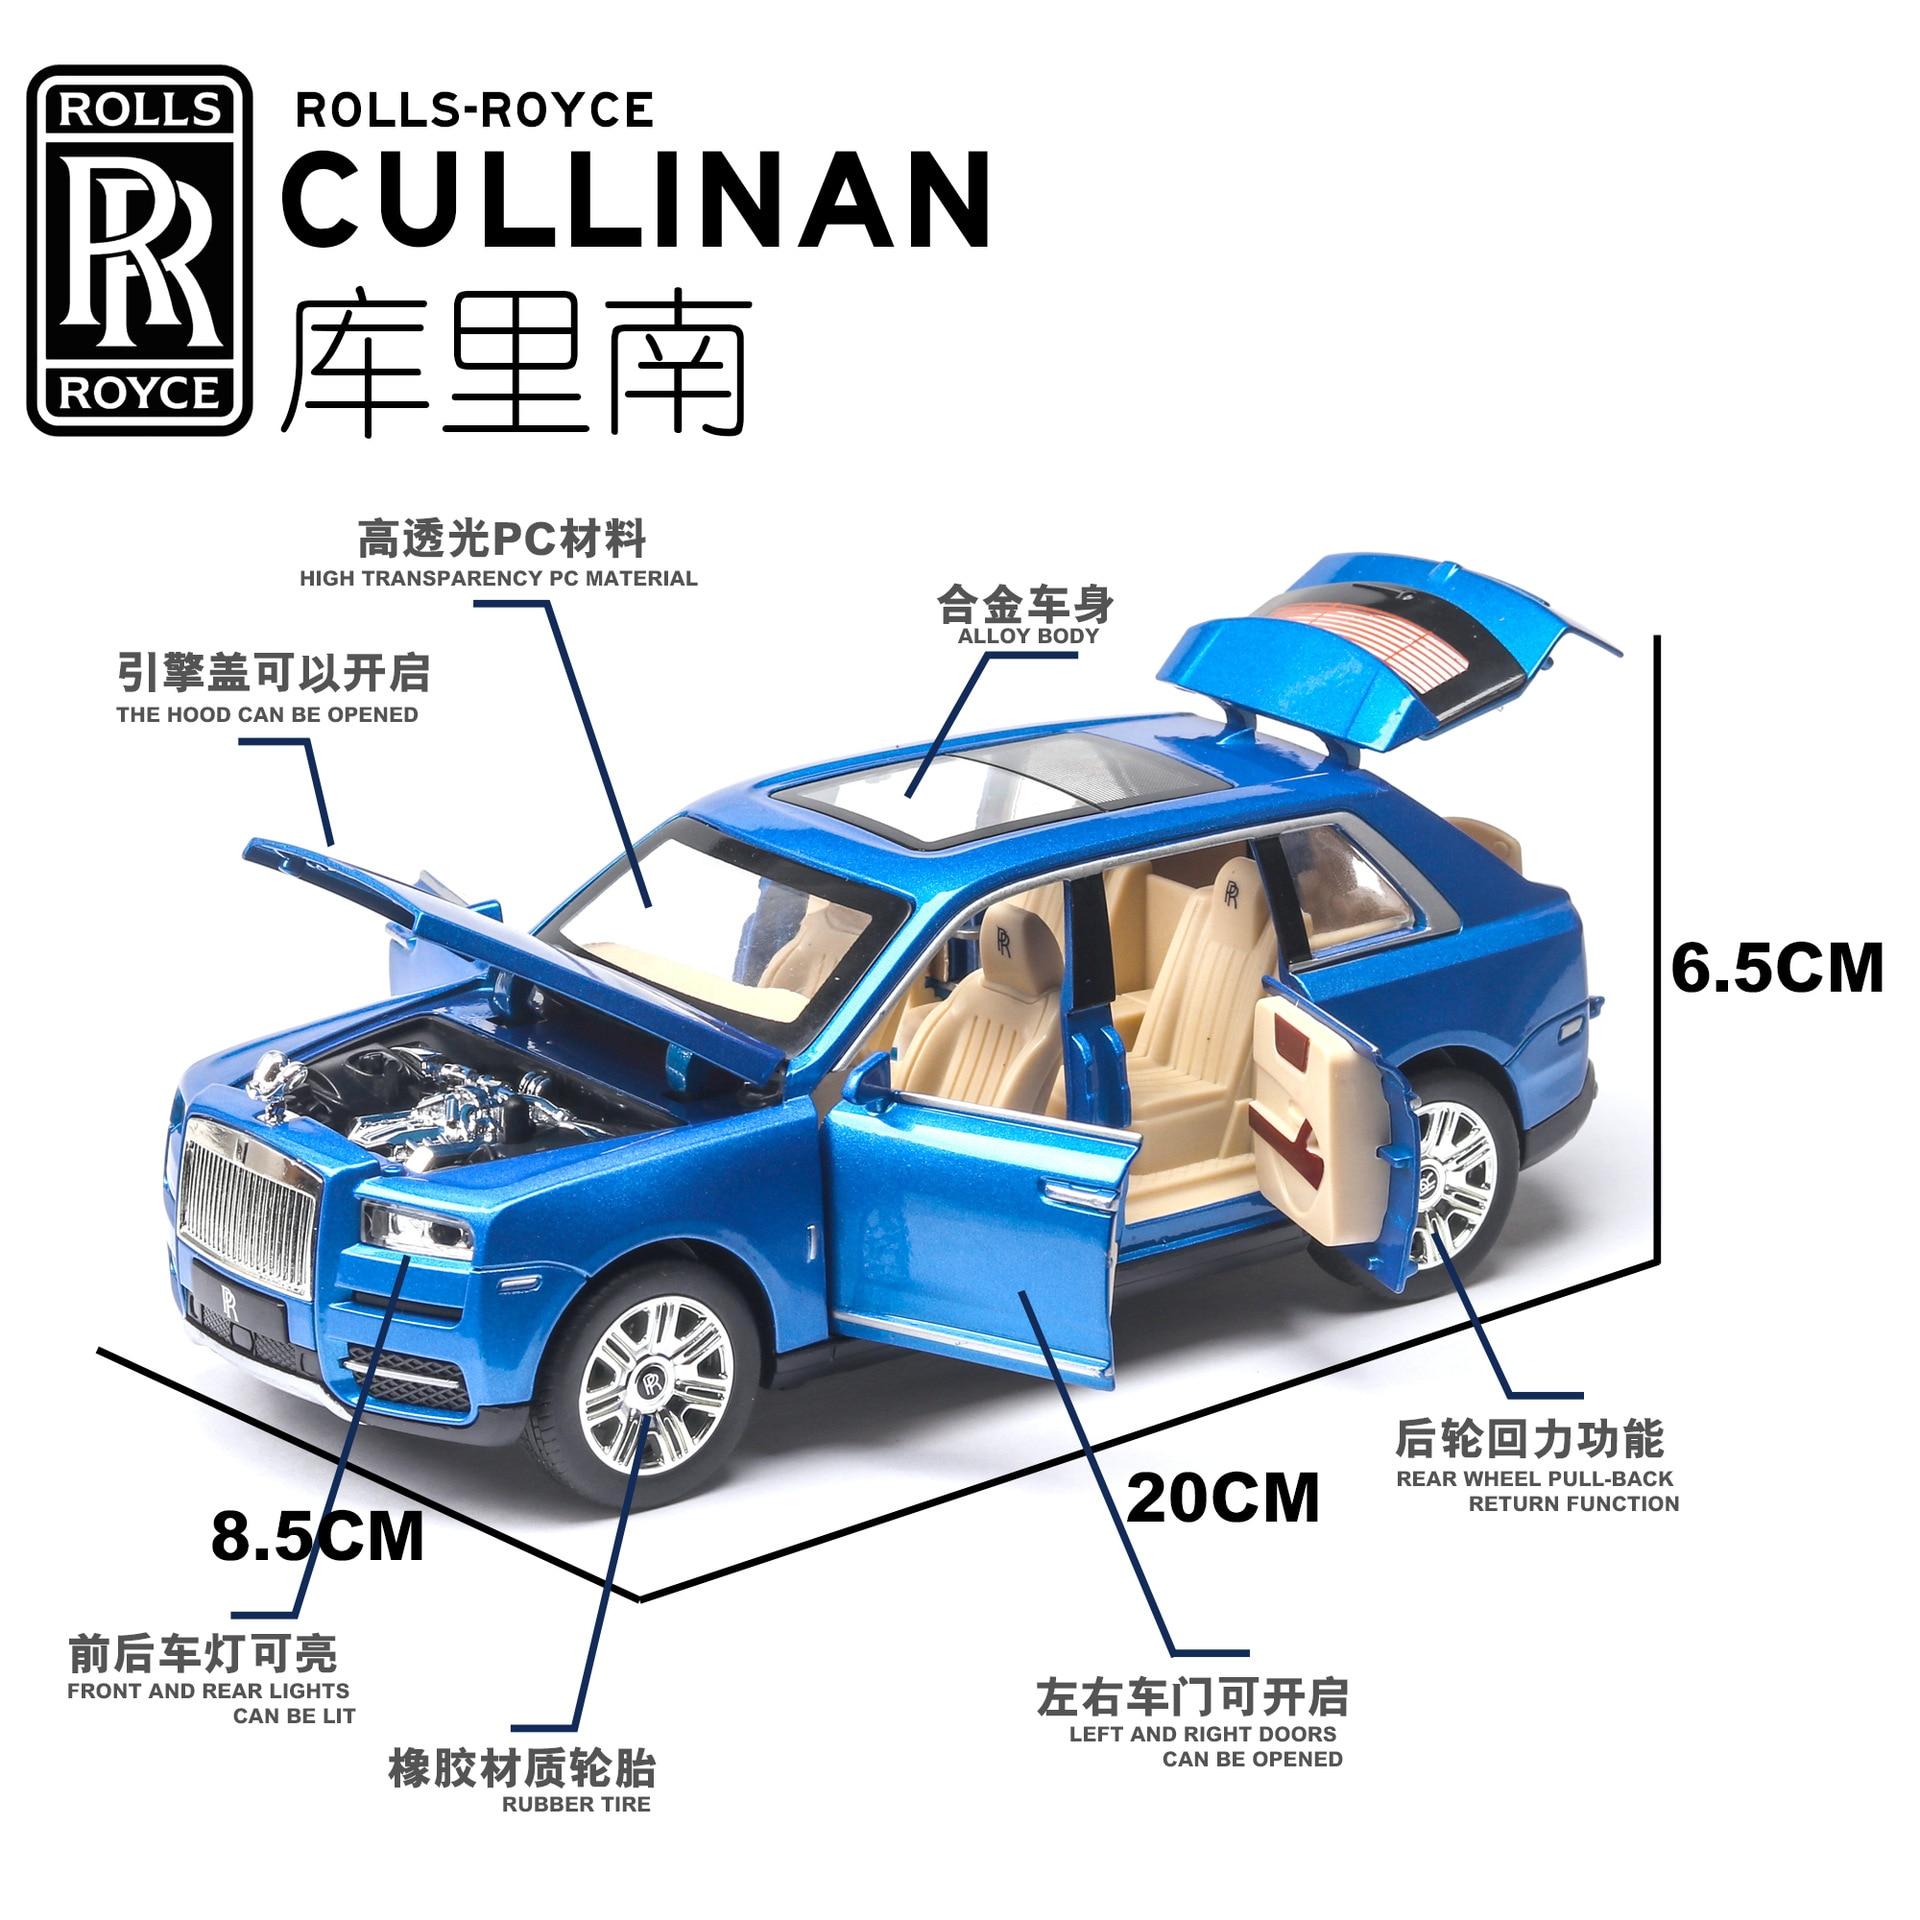 1 24 Diecast Car Model Toy Vehicle Rolls Royces Cullinan SUV Metal Wheels Sound Light Pull